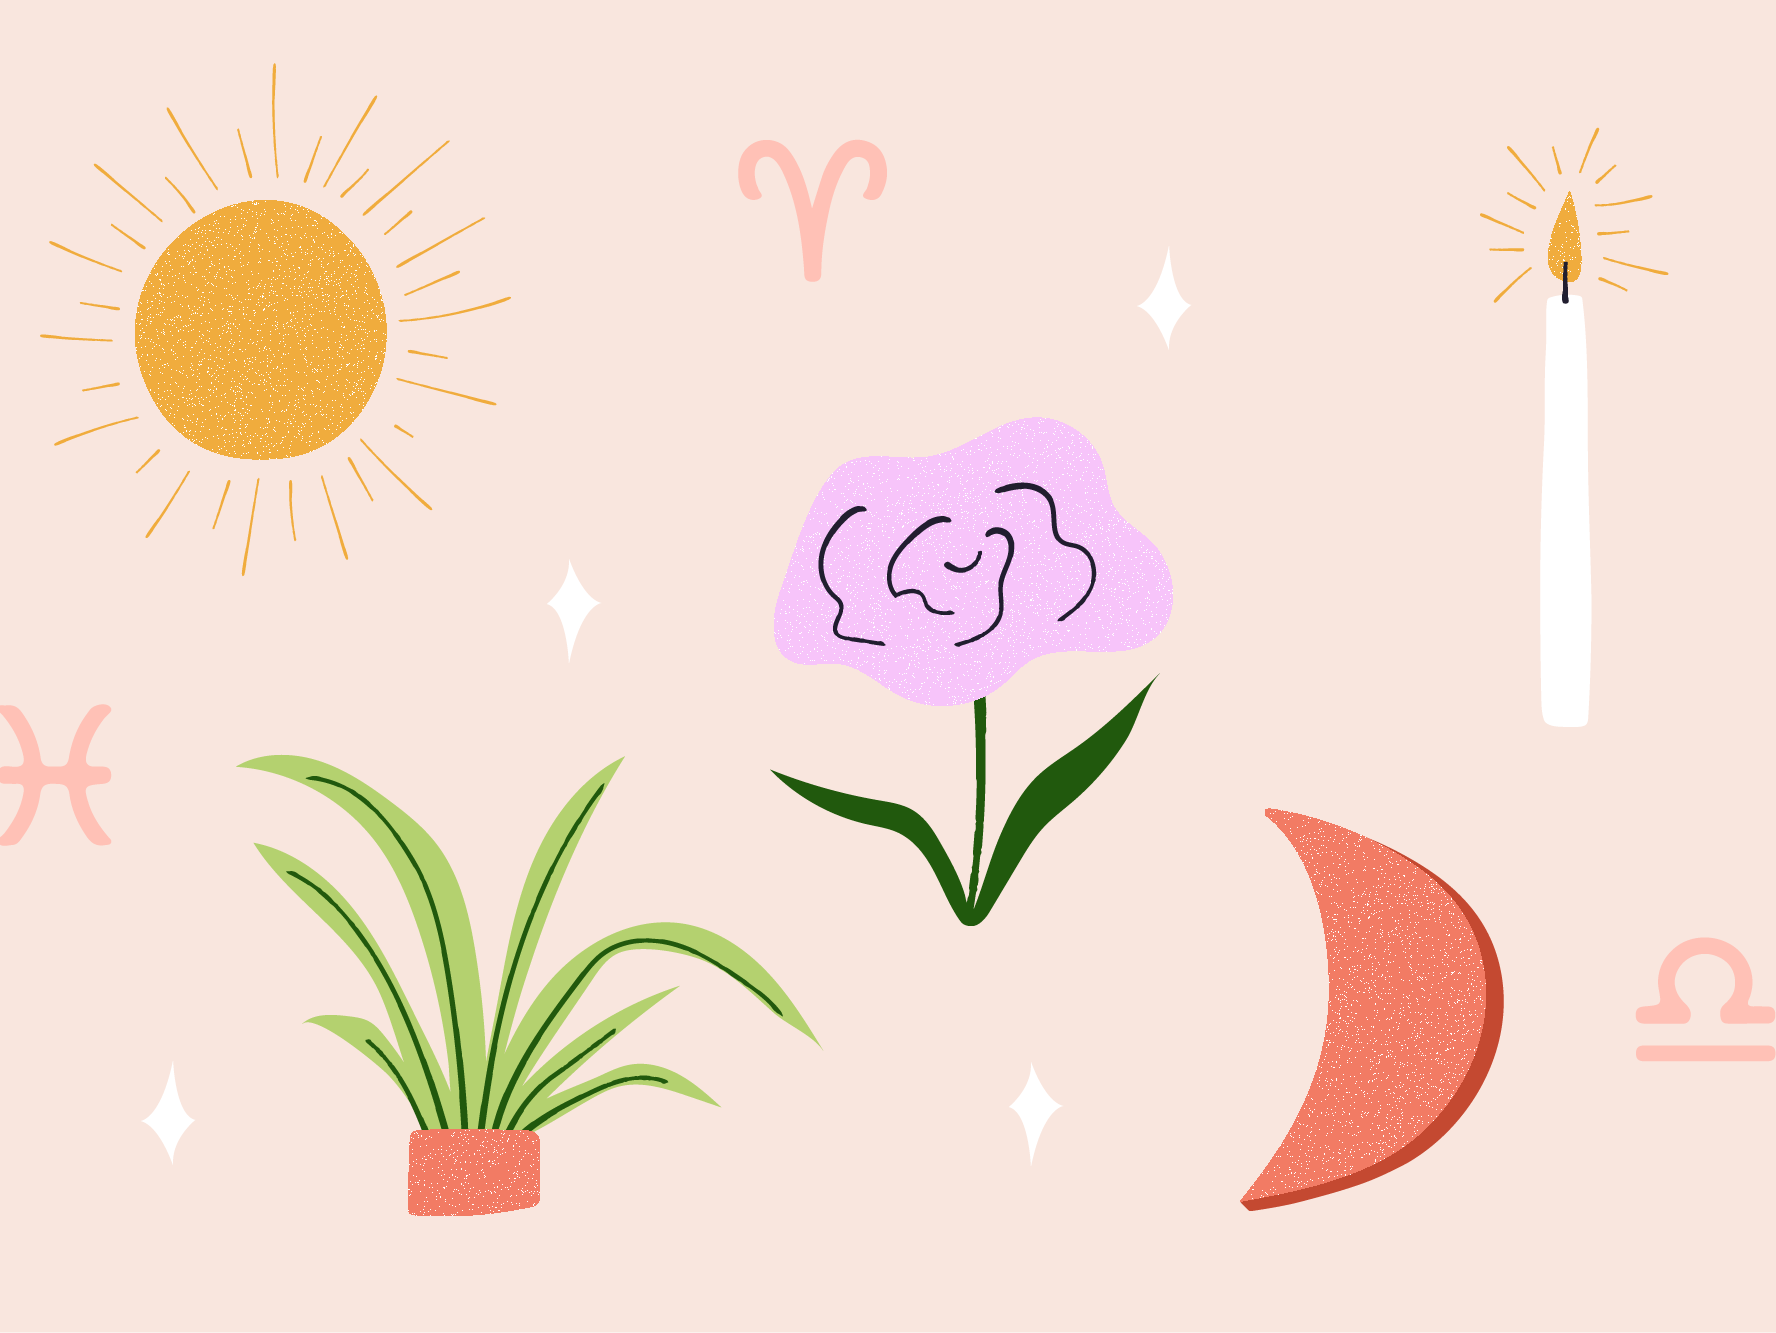 Spring equinox horoscope 2